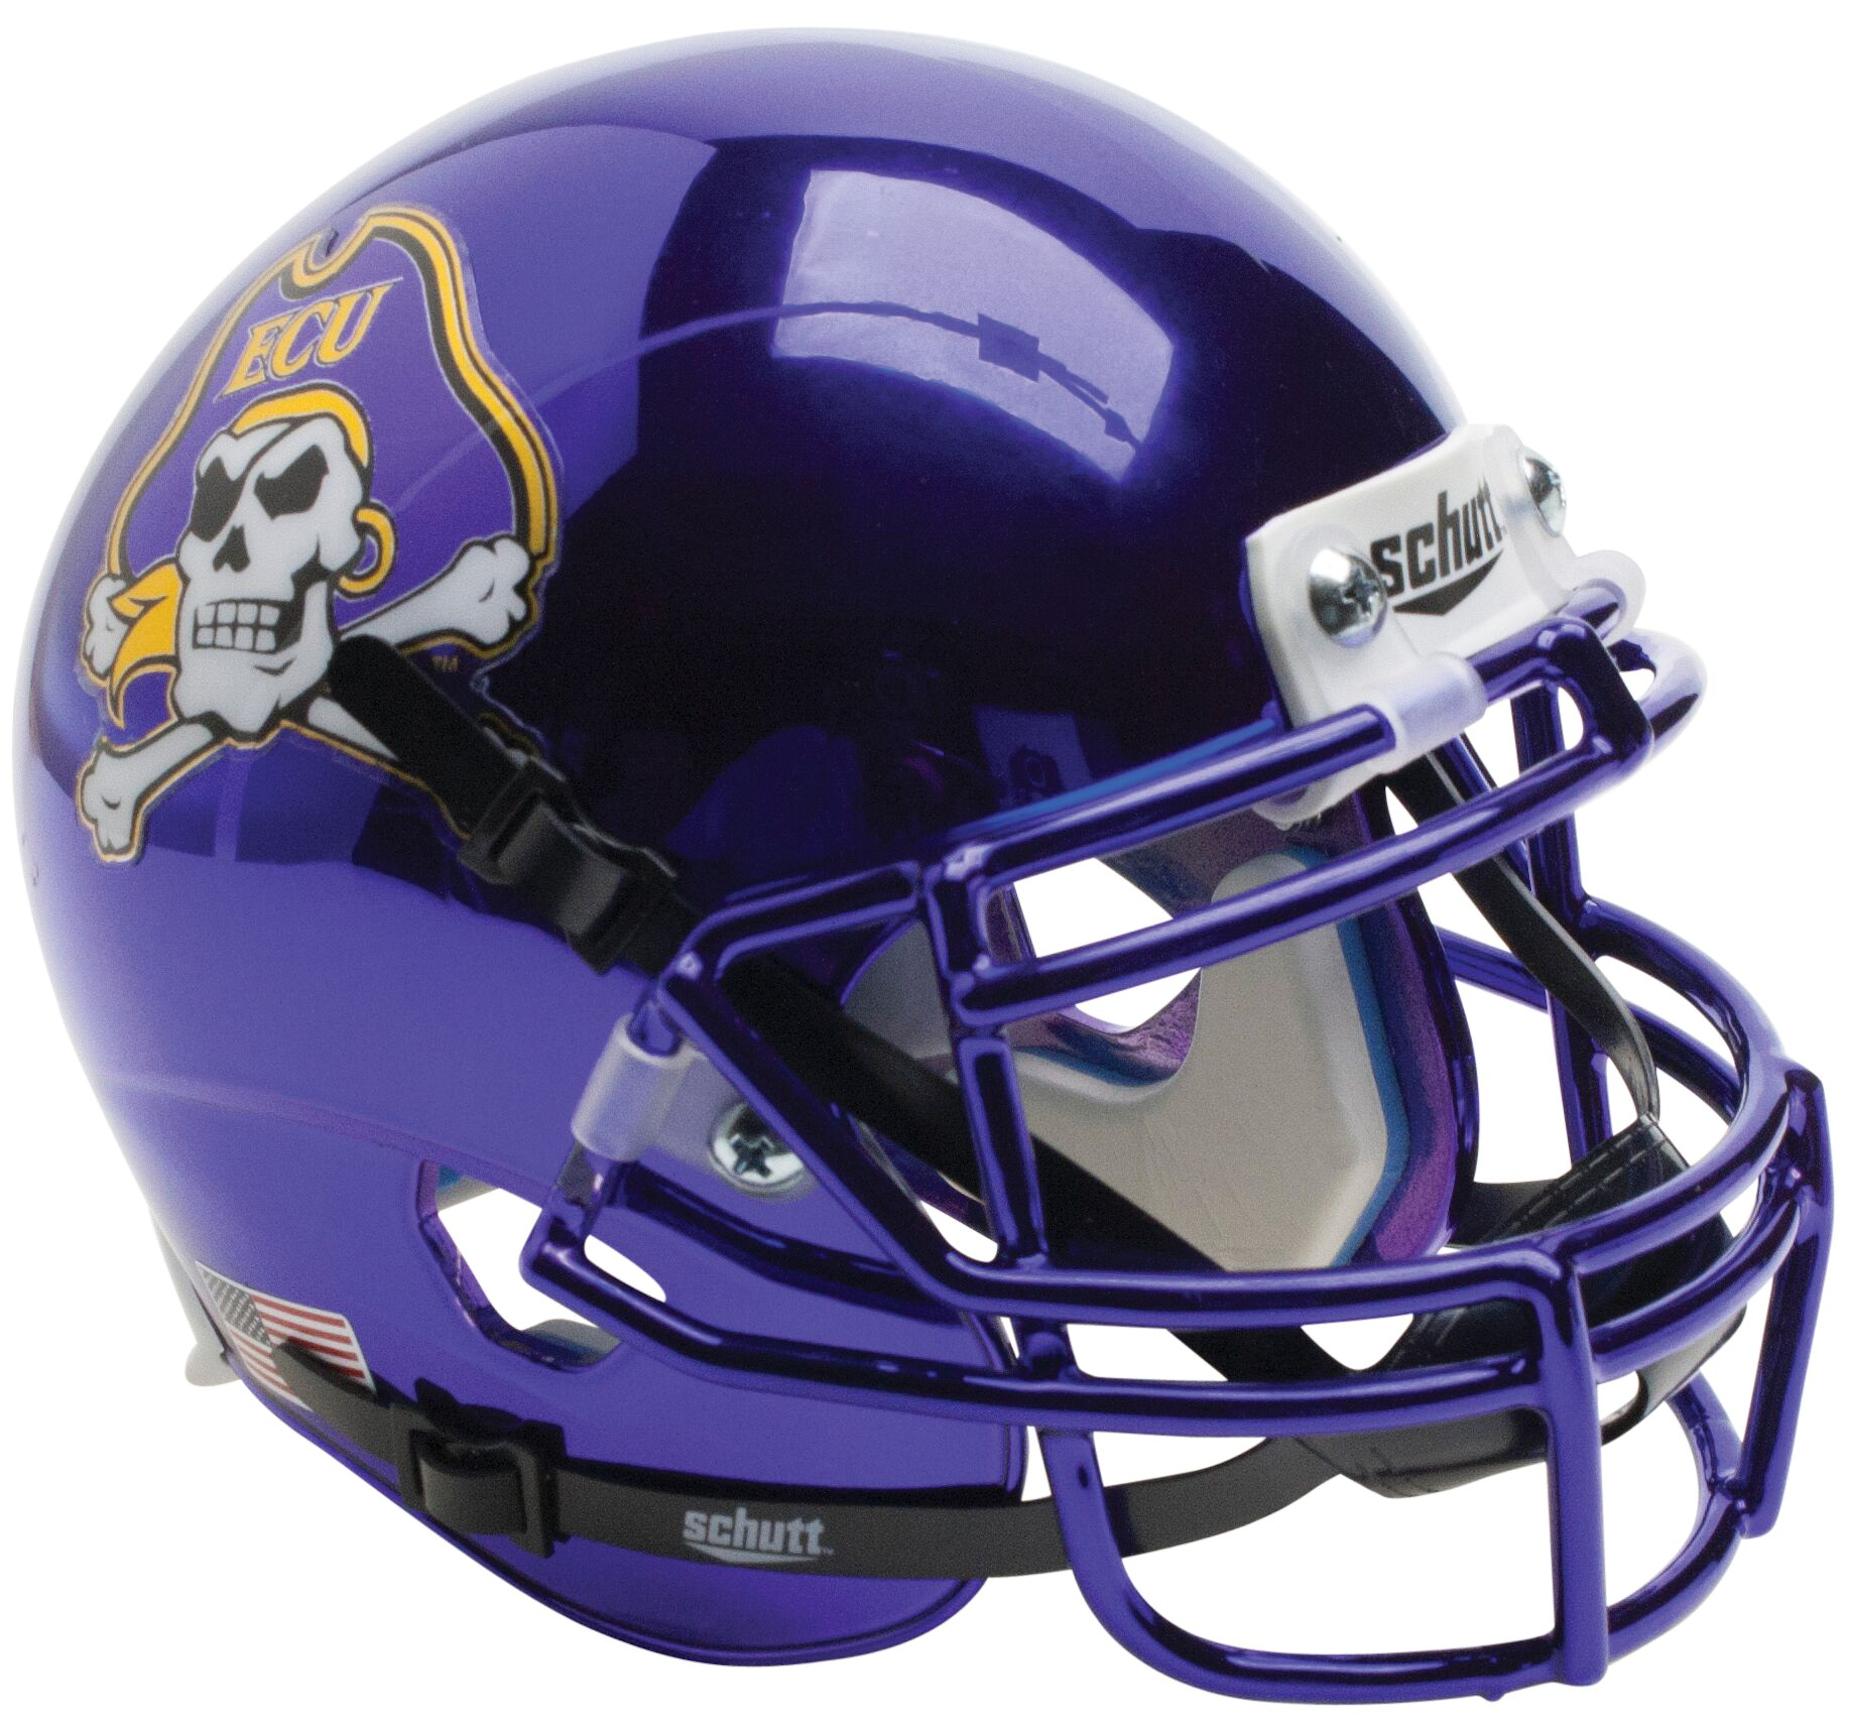 East Carolina Pirates Authentic College XP Football Helmet Schutt <B>Chrome</B>